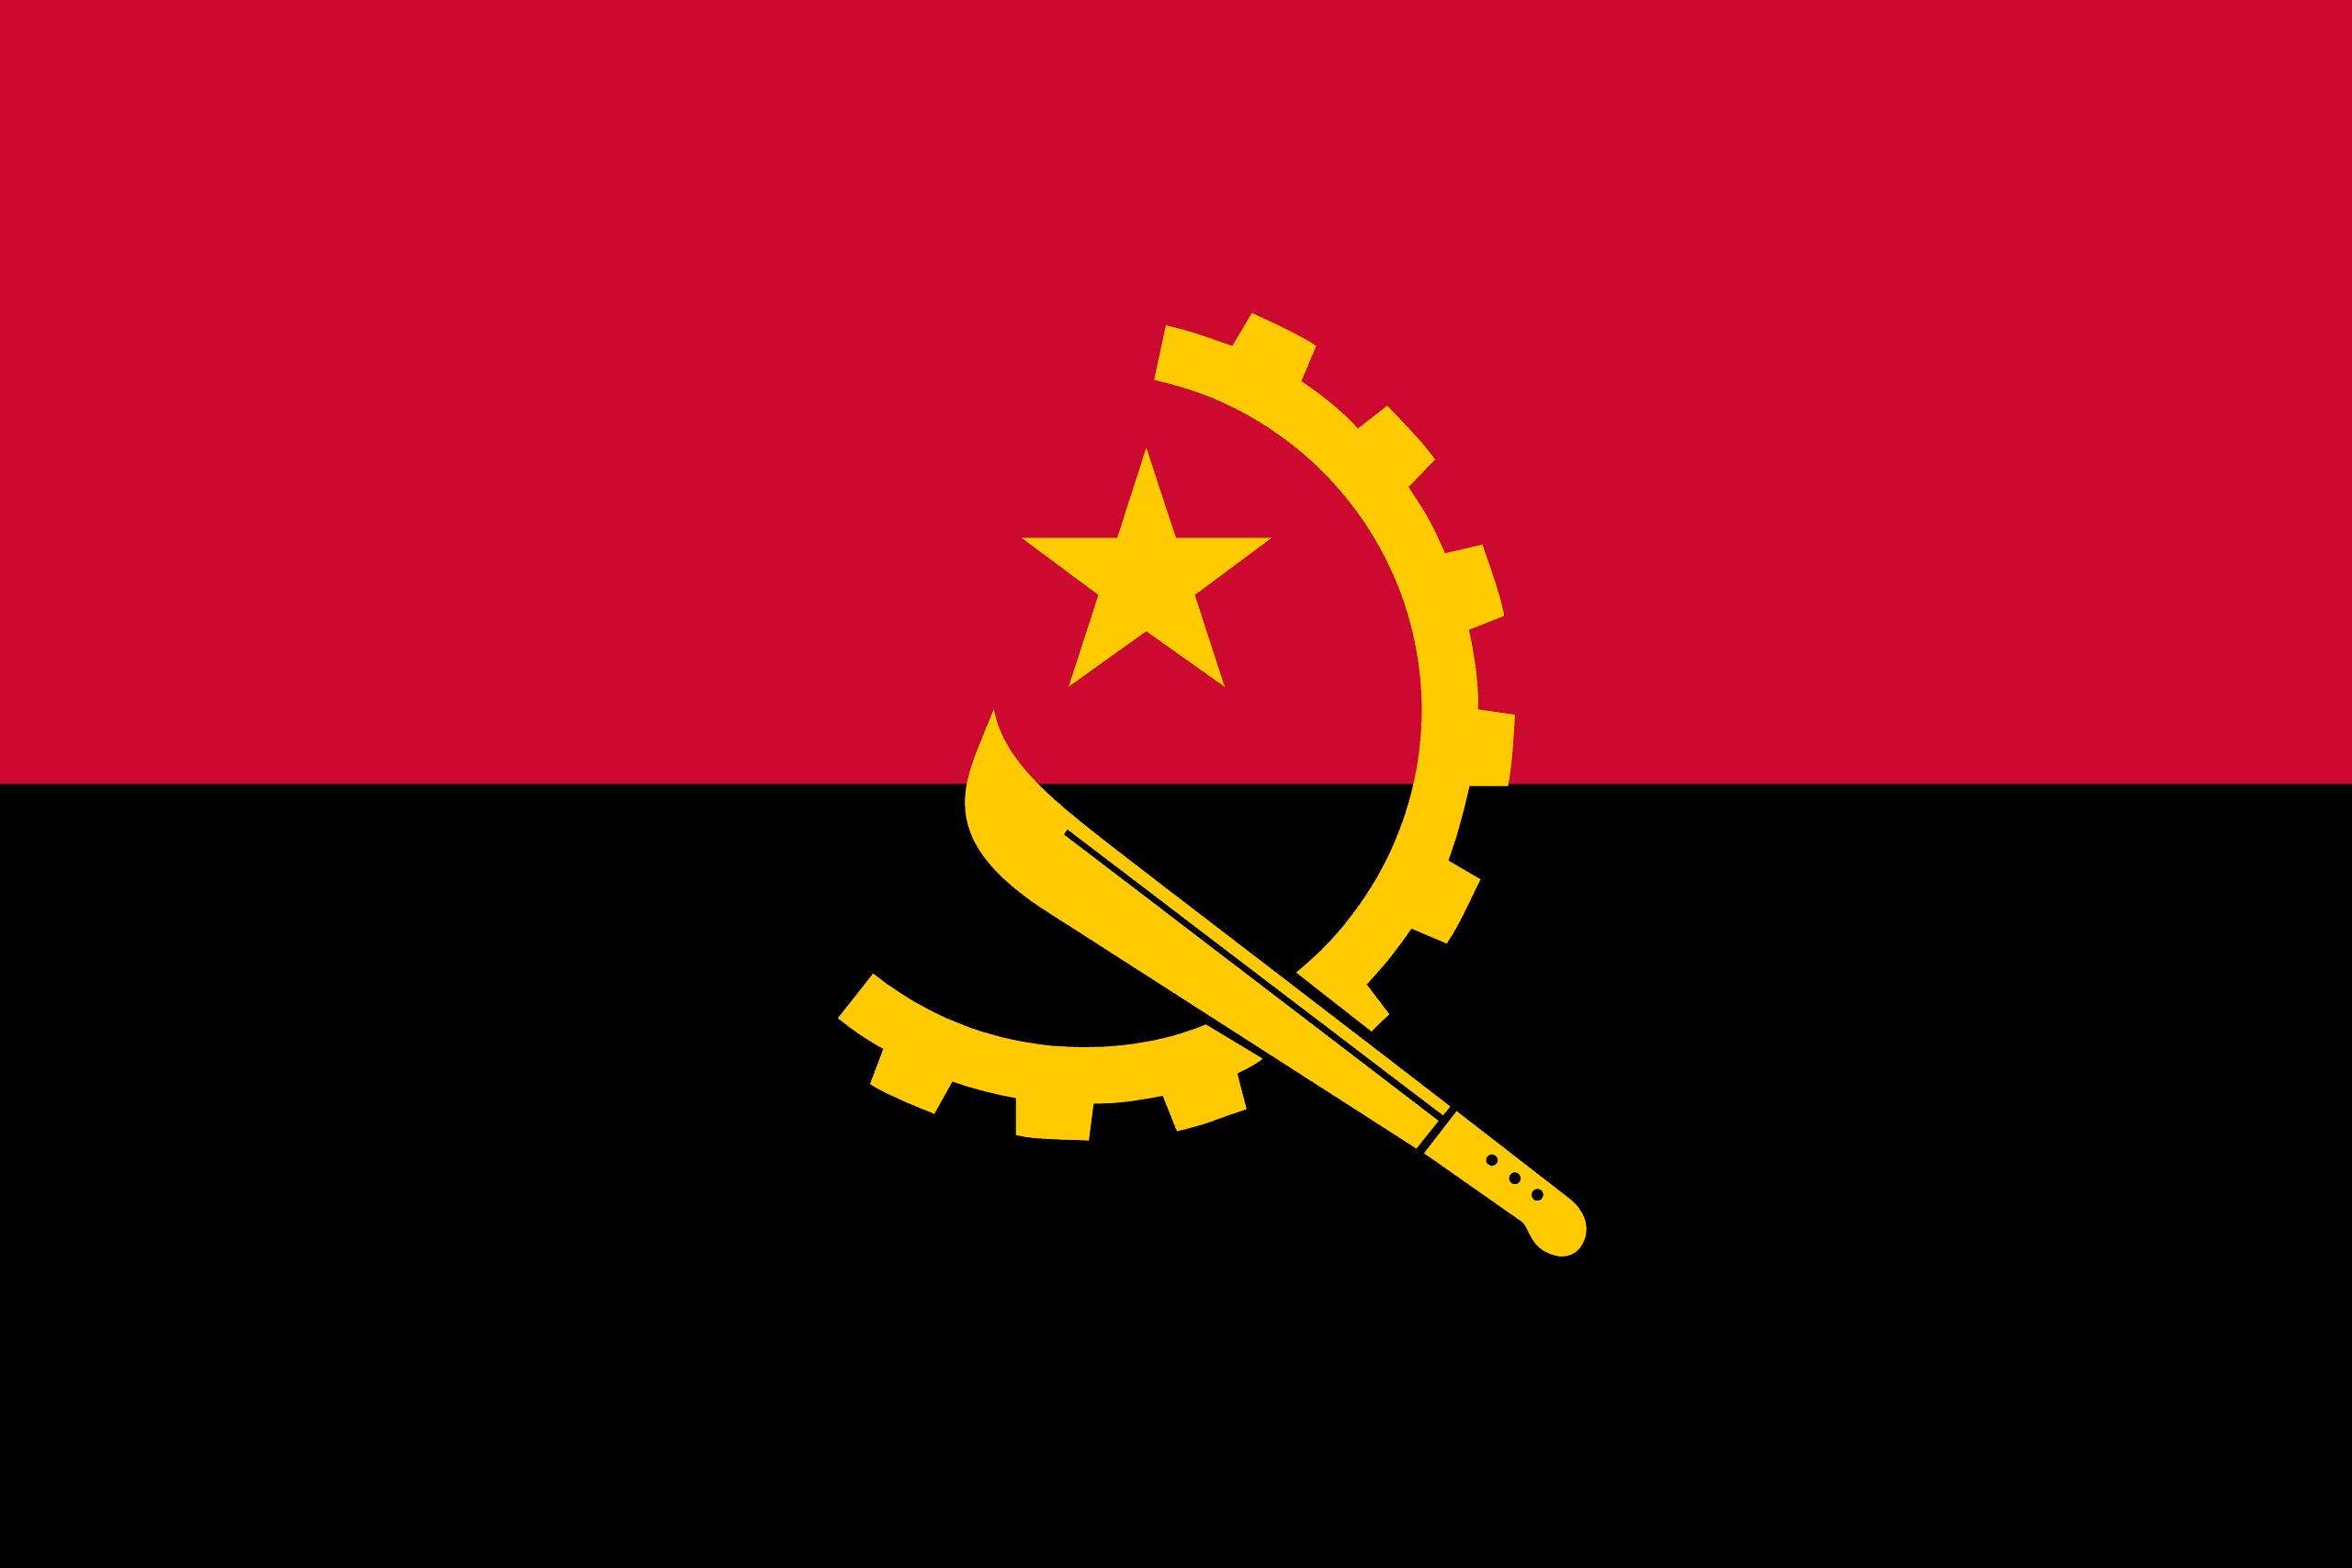 angola - Image